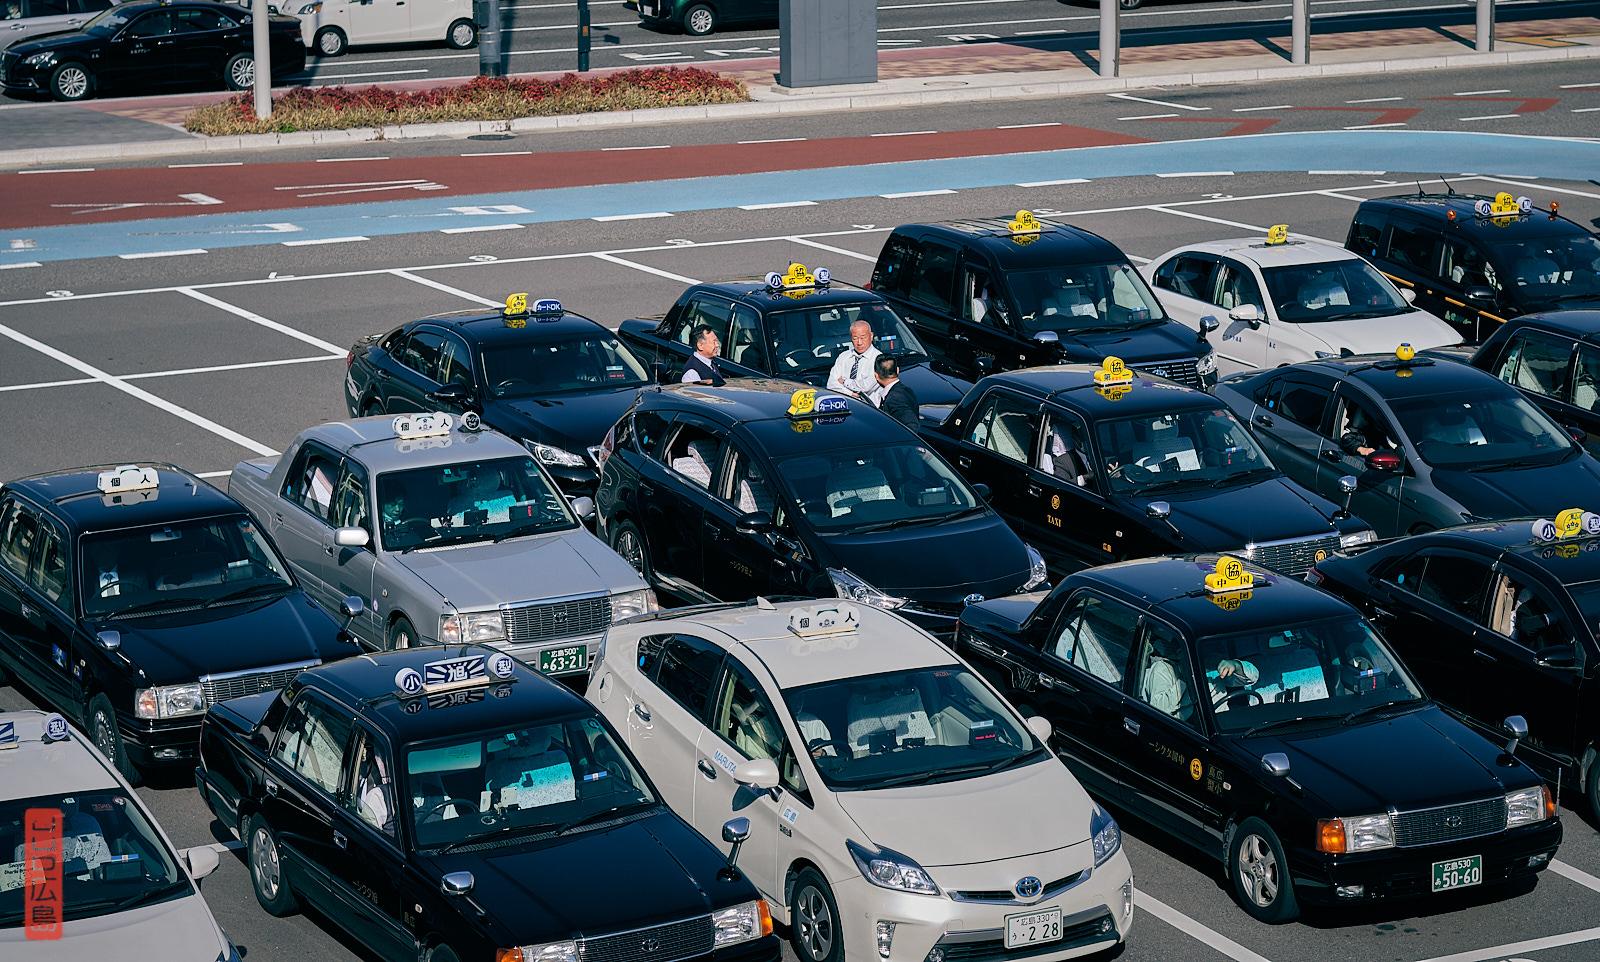 Chauffeurs de taxi japonais, gare d'Hiroshima